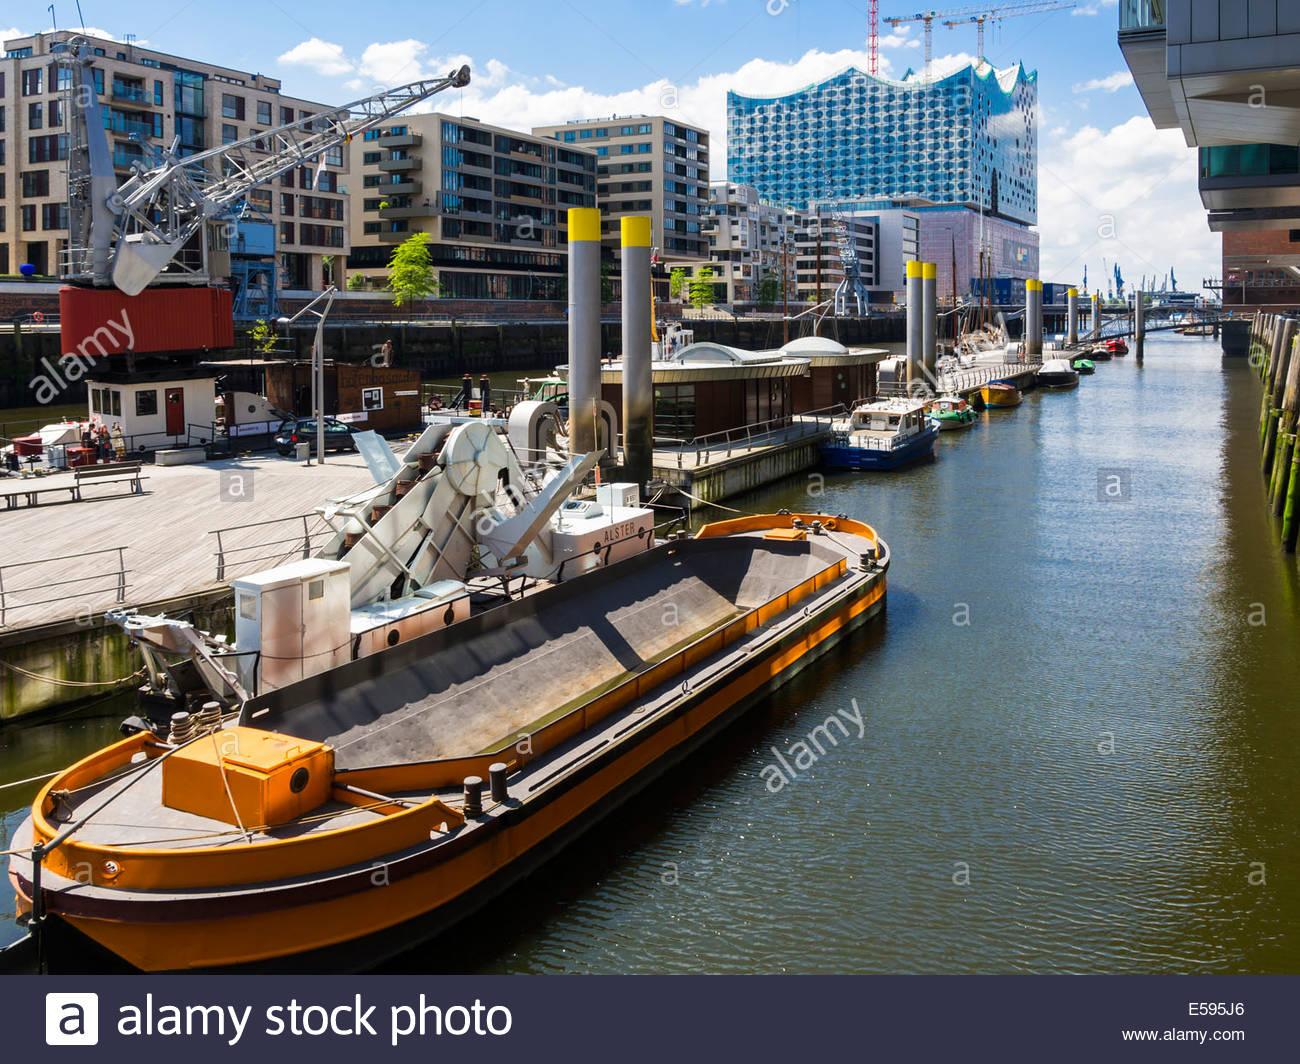 Germany, Hamburg, HafenCity, Magellan-Terrassen, Sandtorkai, Sandtorhafen, Traditional Harbour with modern residential - Stock Image